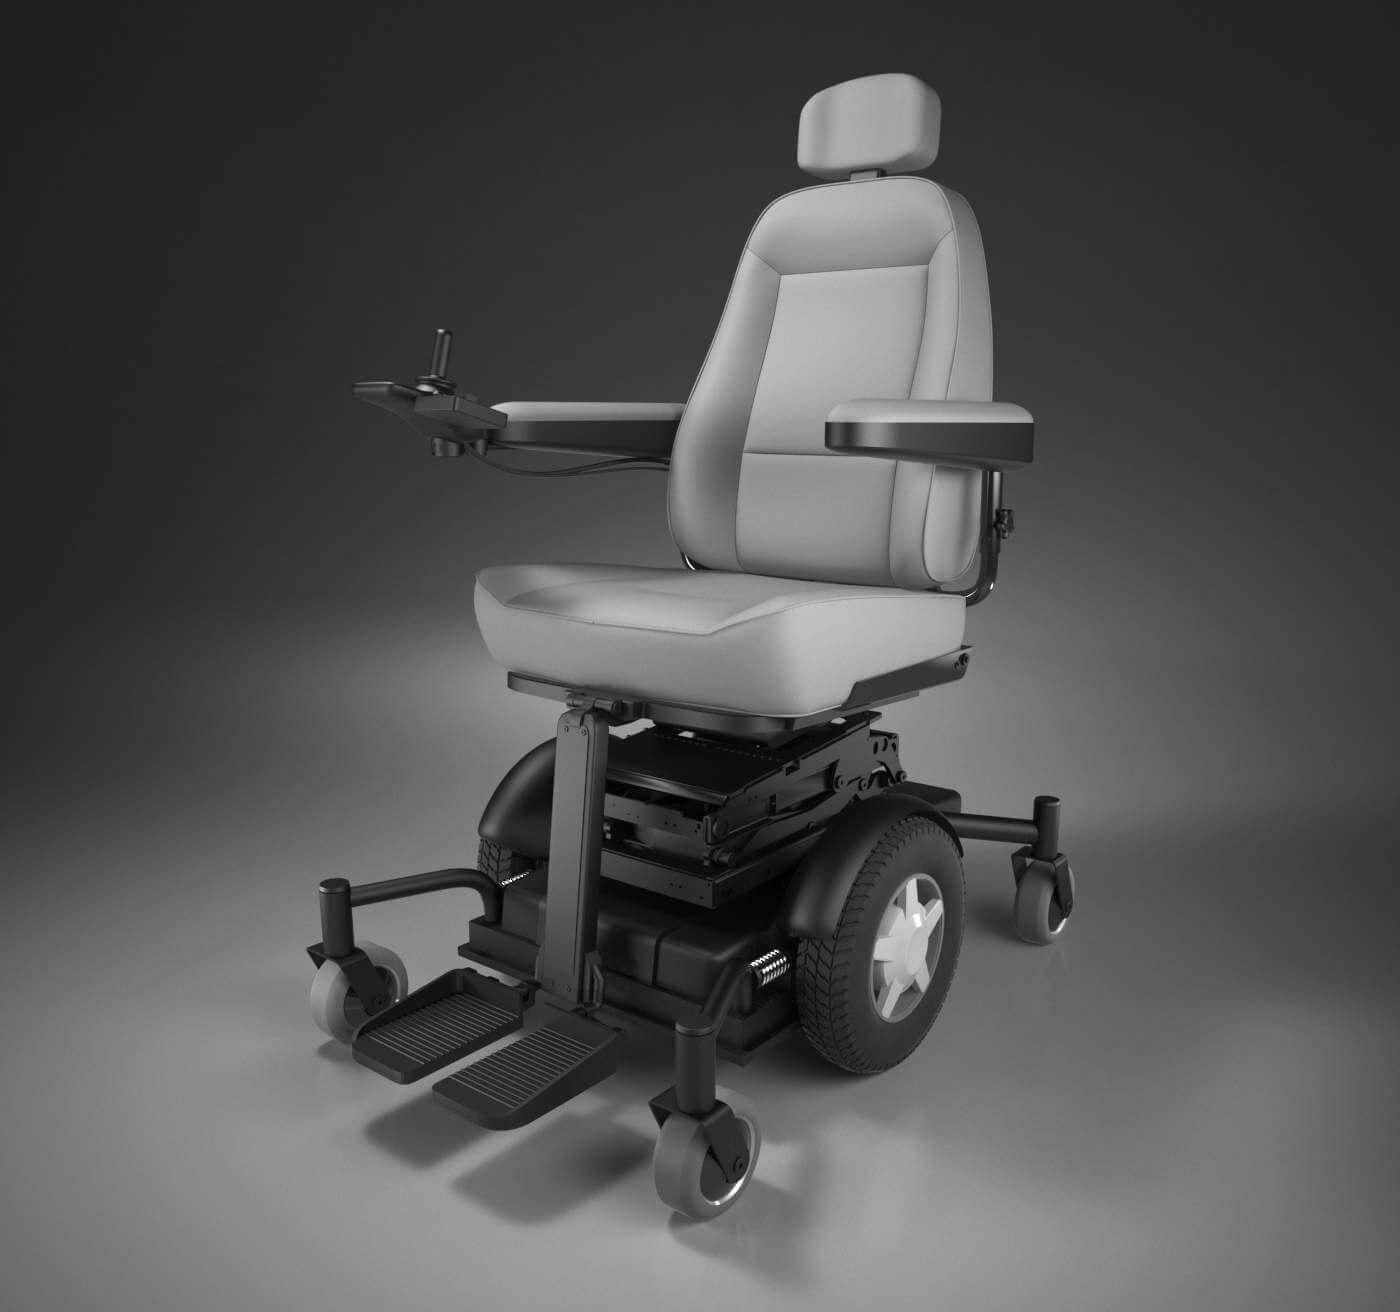 Motorized Wheelchair 3d Model